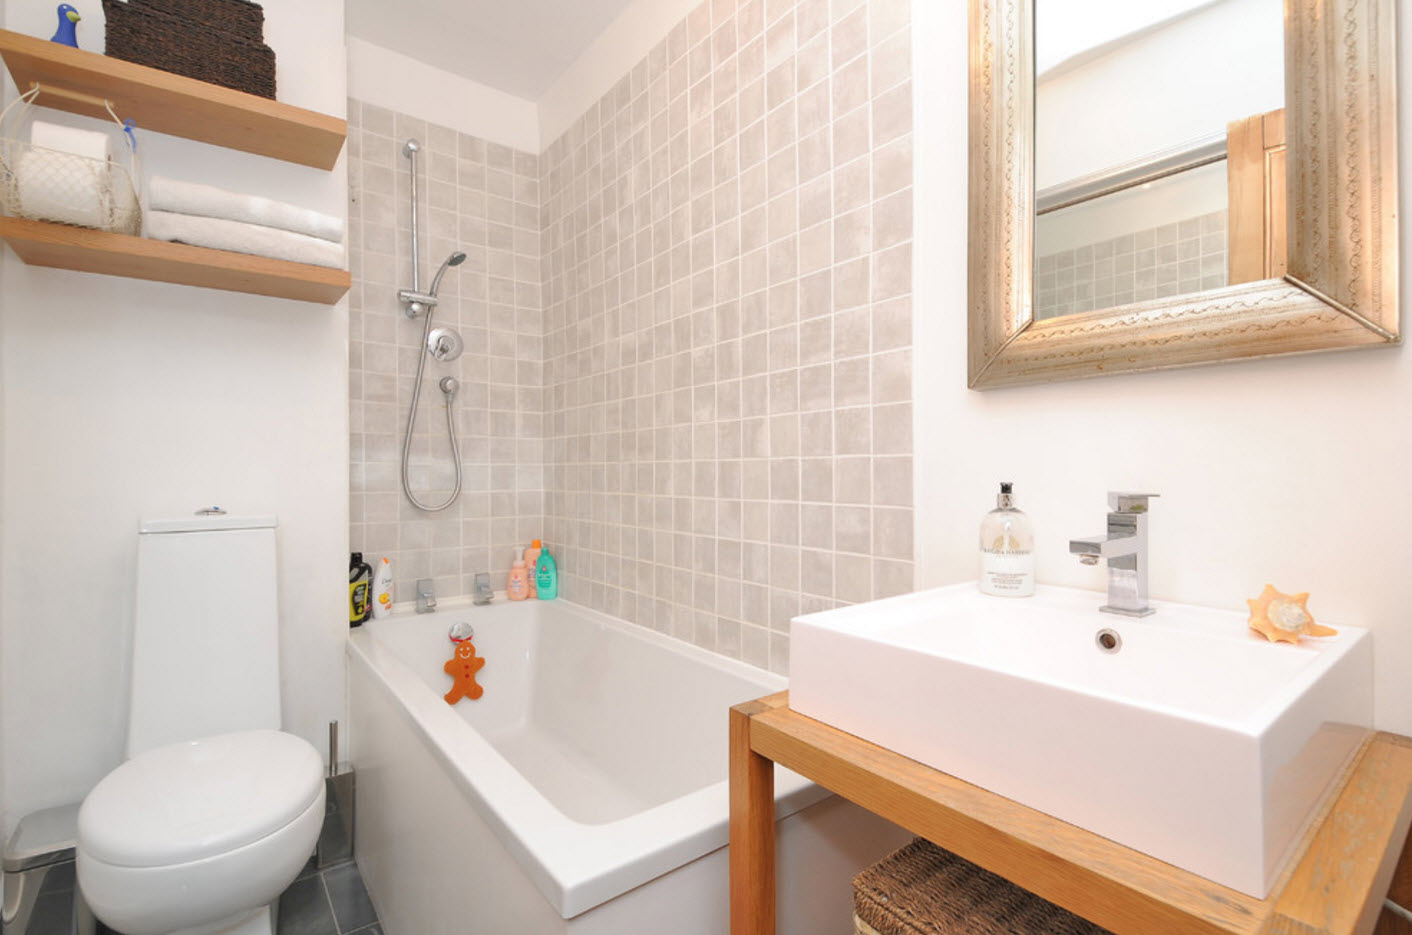 Крохотная ванная комната мебель и сантехника для ванных